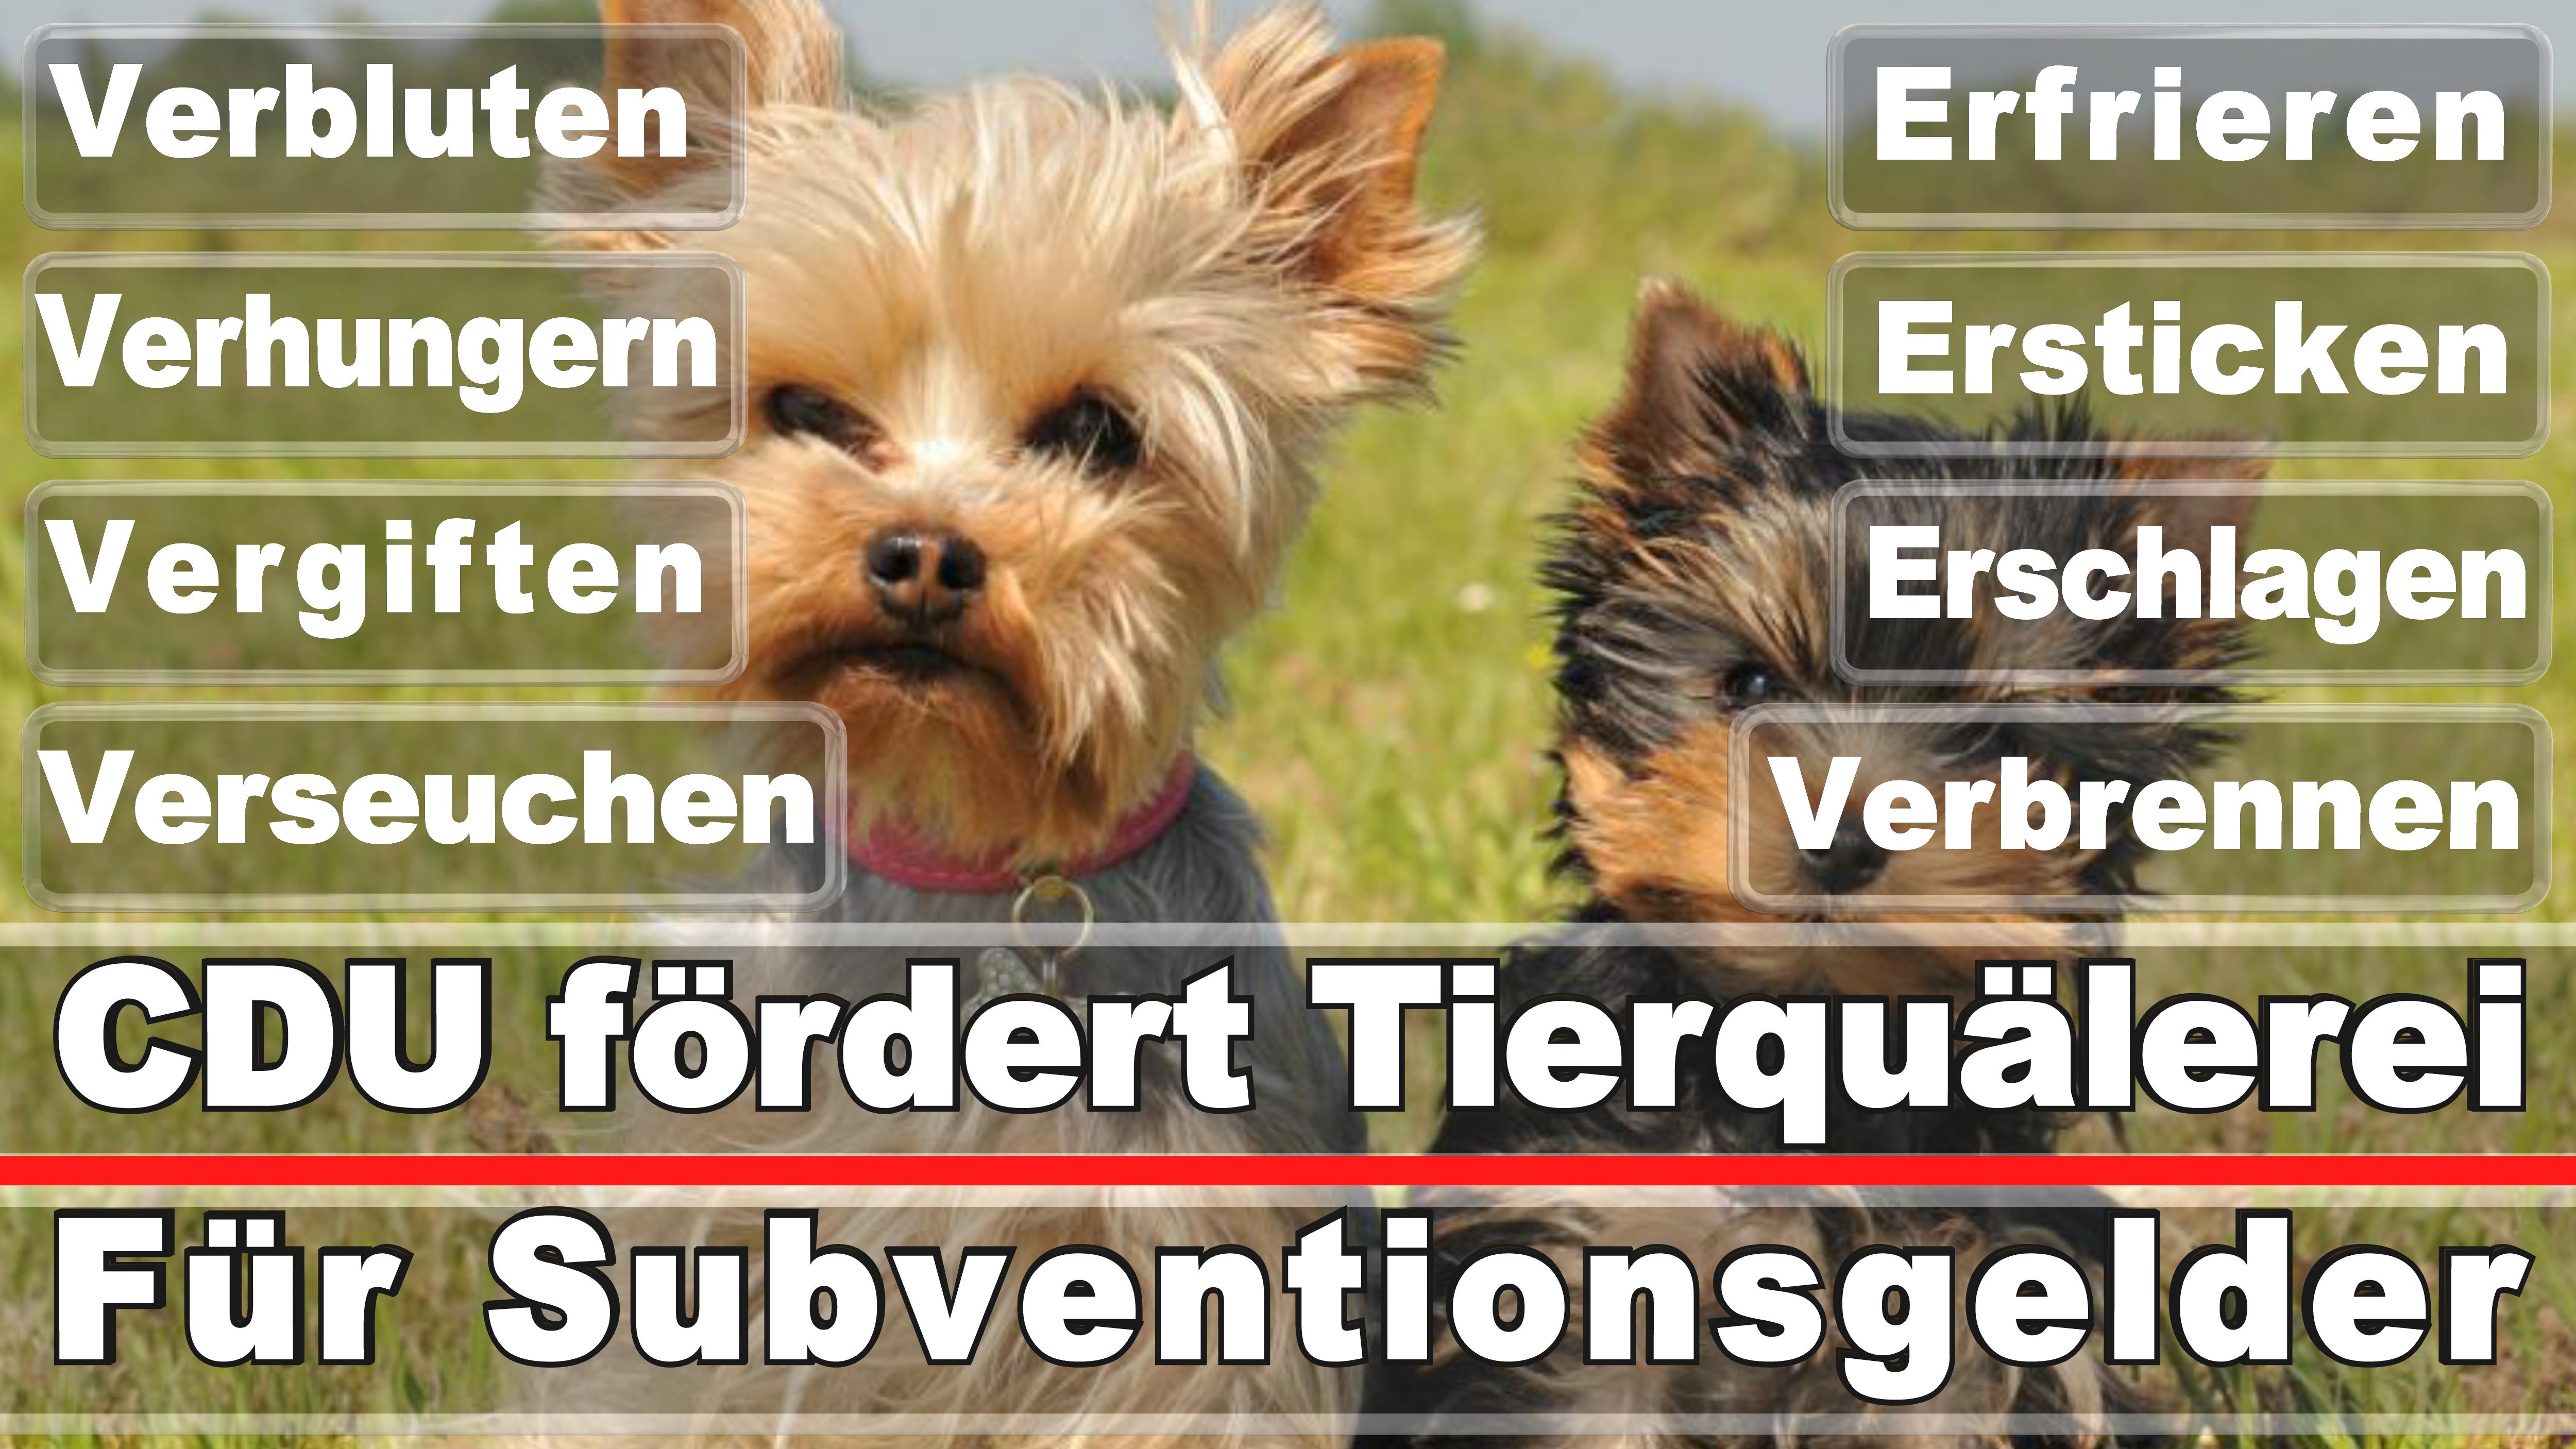 Landtagswahl-Bundestagswahl-CDU-SPD-FDP-AFD-Linke-Piraten-Tierschutzpartei (25)